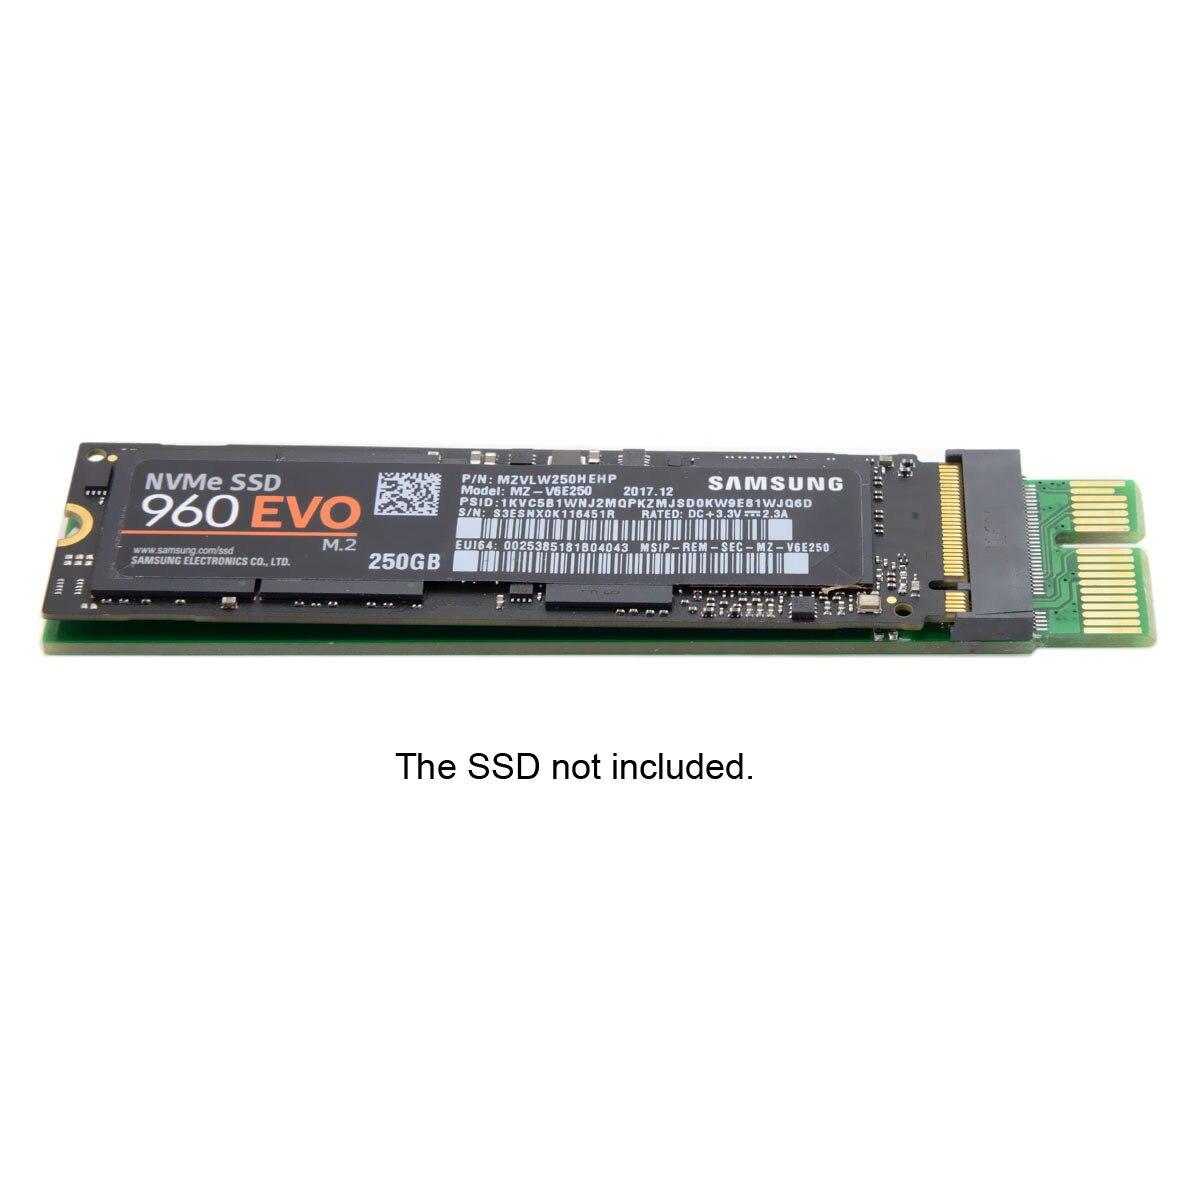 CYSM NGFF M-key M Key M.2 NVME AHCI SSD To PCIe PCI-E 3.0 1x X1 Vertical Adapter For XP941 SM951 PM951 960 EVO SSD